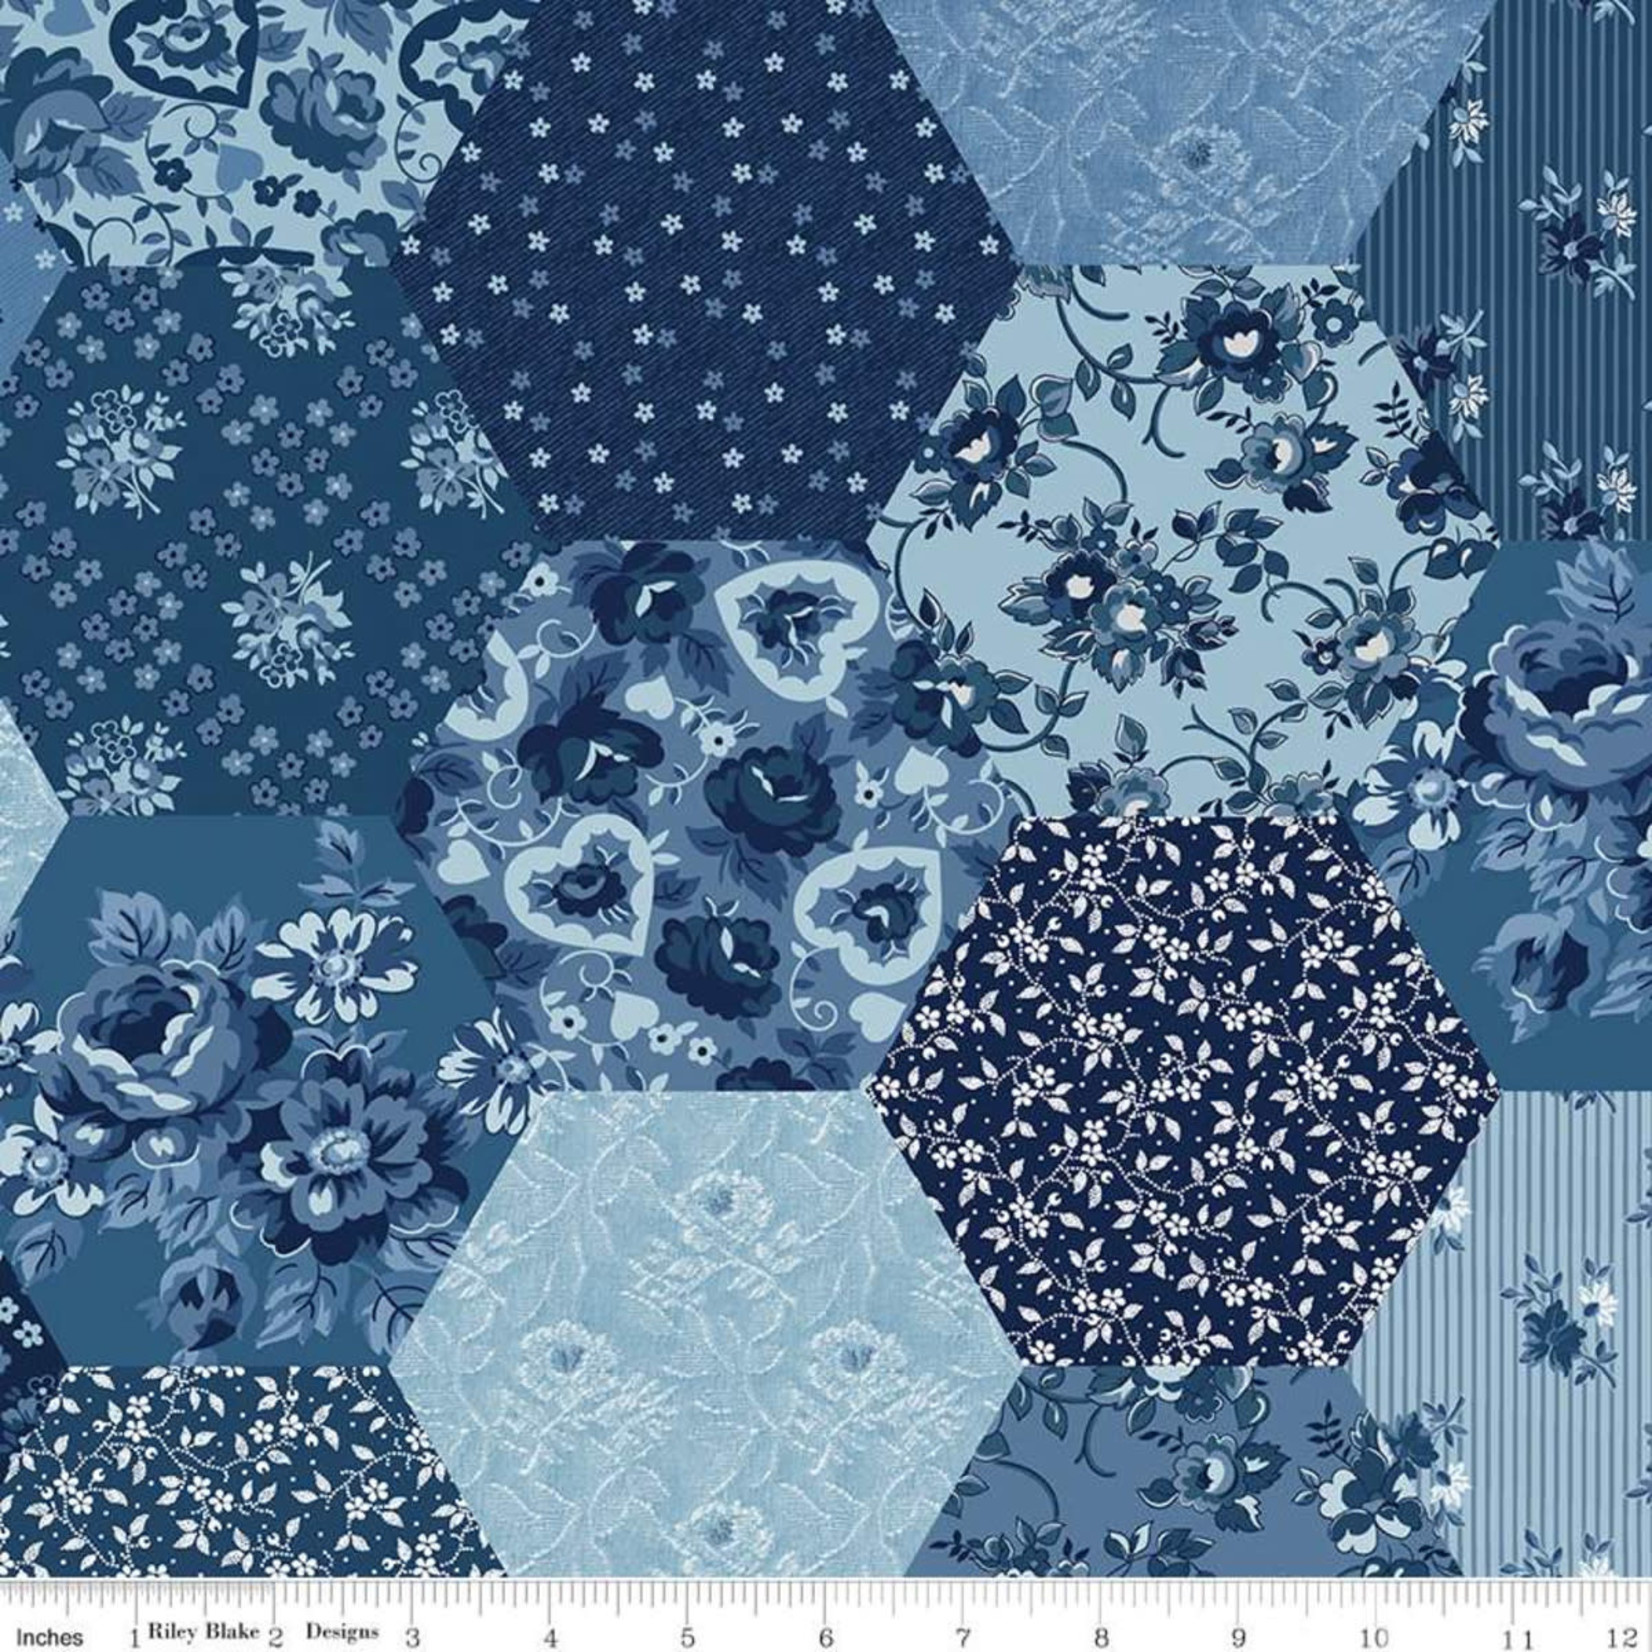 Riley Blake Designs Delightful Patchwork - Blue